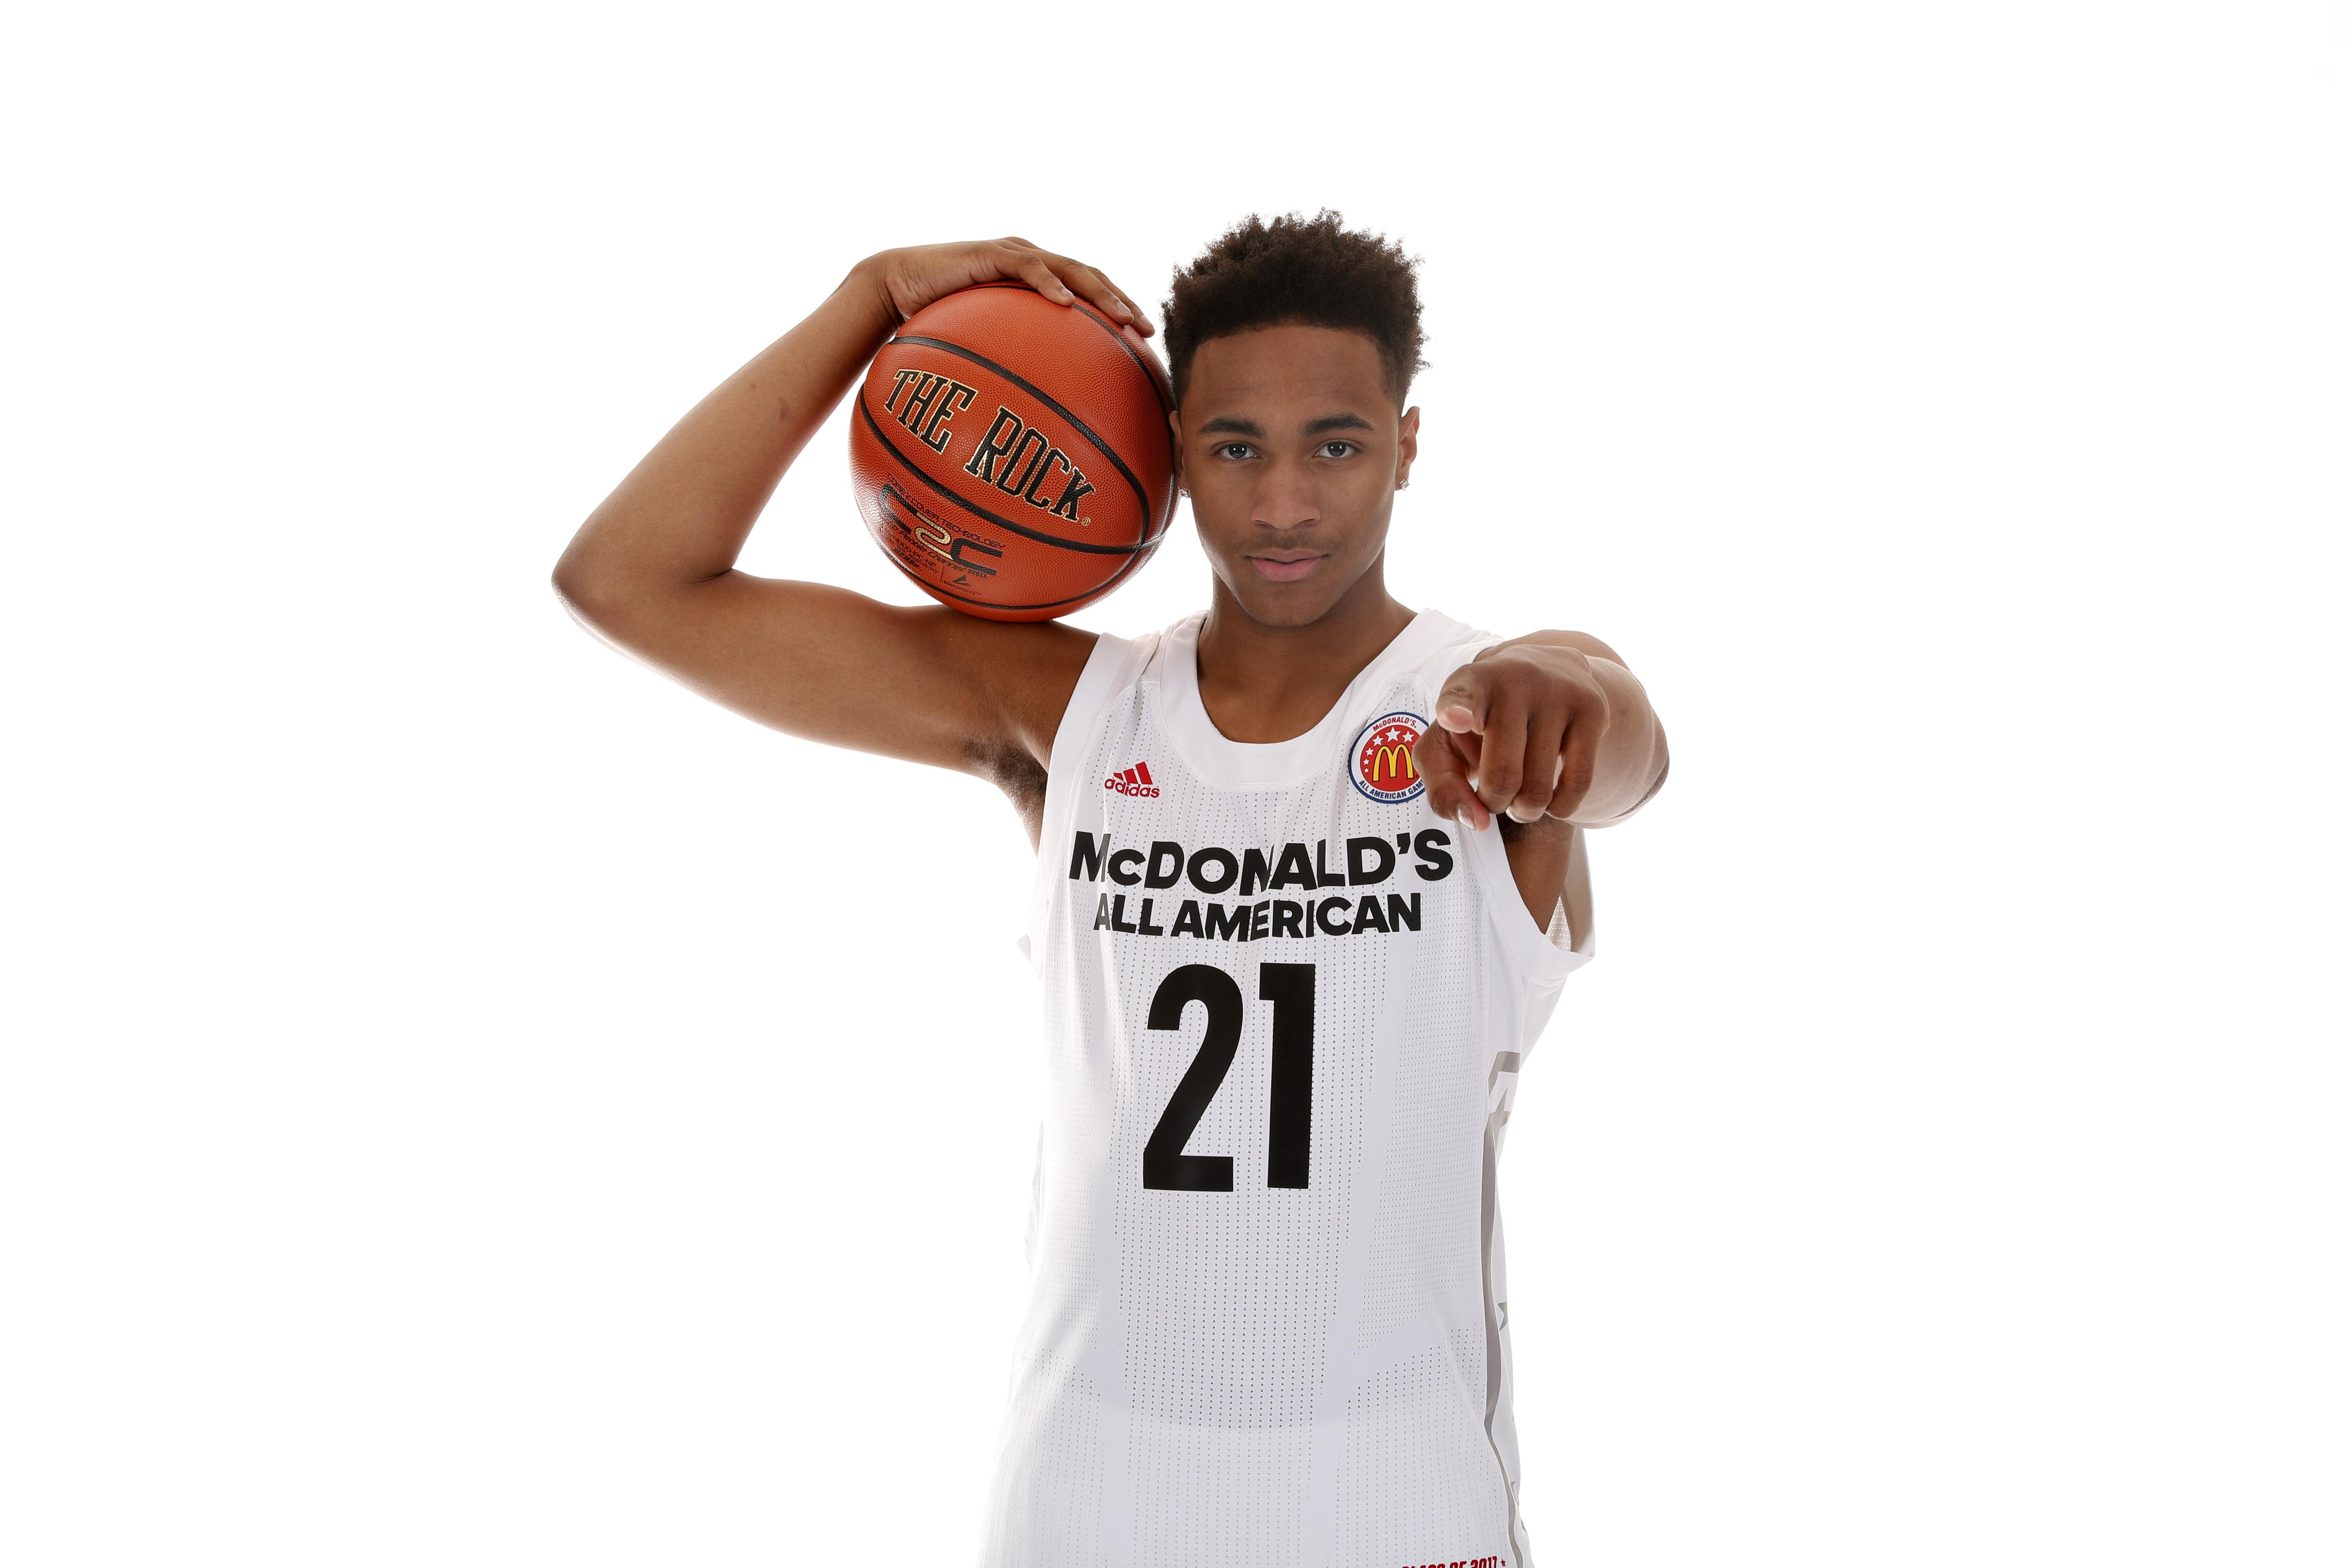 9975018-high-school-basketball-mcdonalds-all-american-portraits